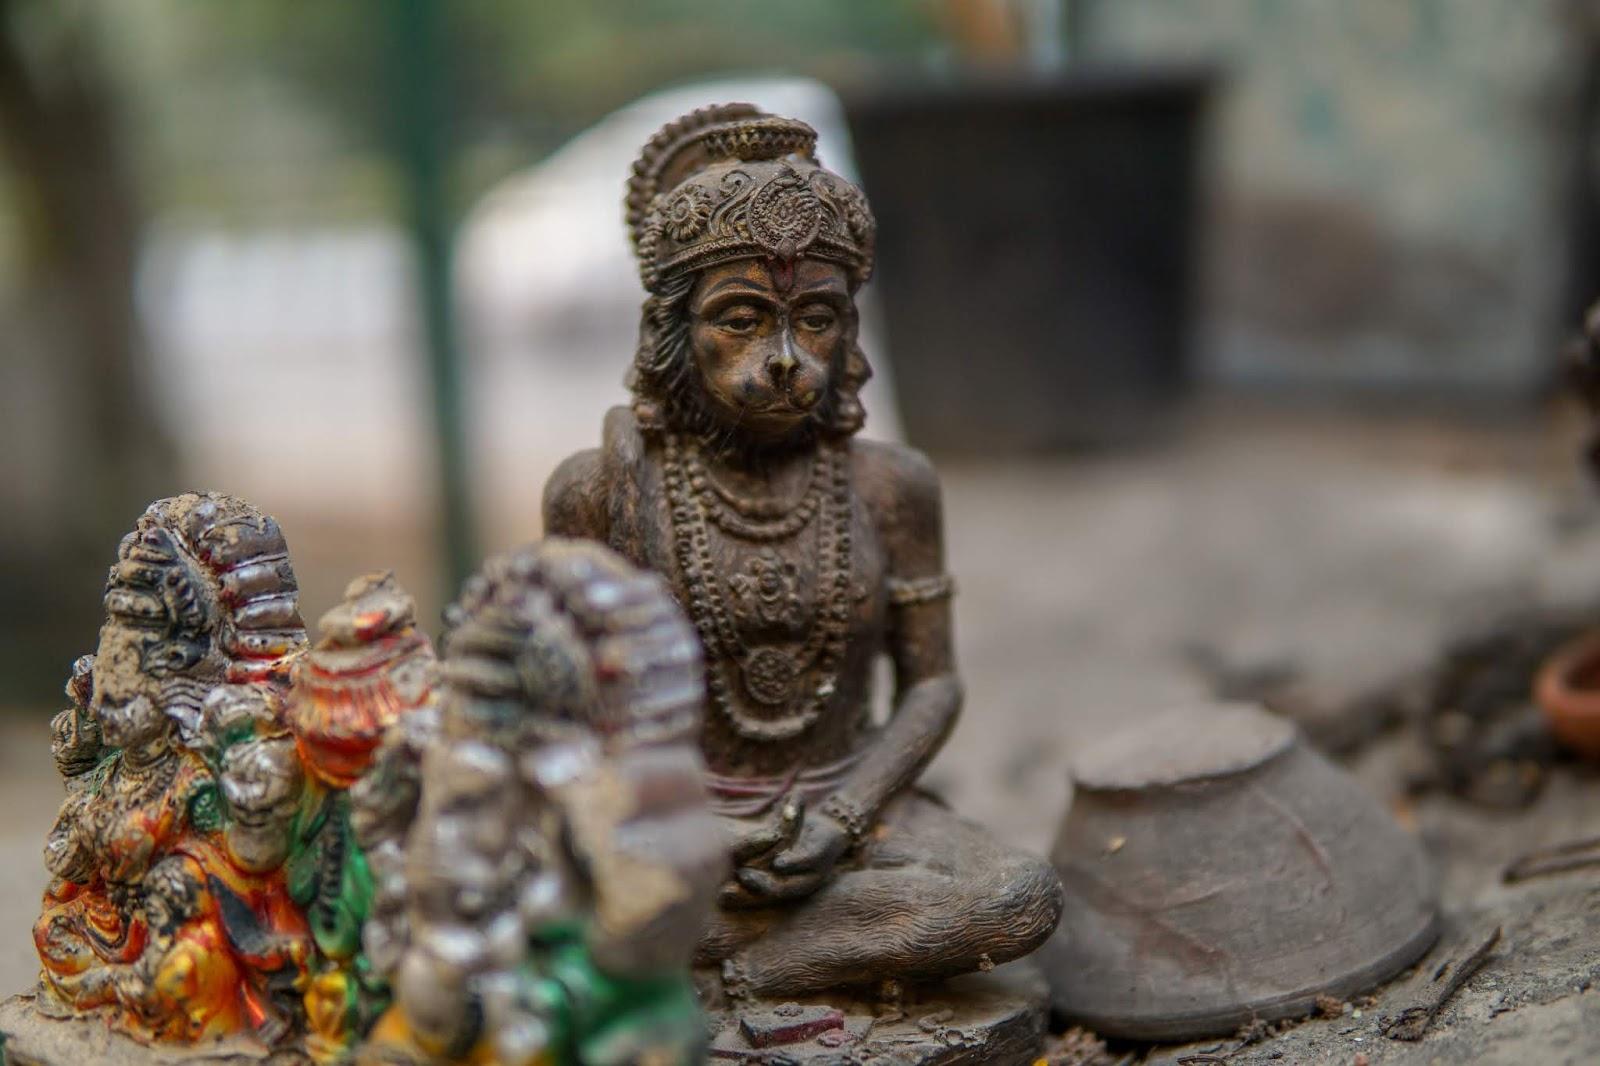 hanuman Chalisa,suresh wadkar shree hanuman chalisa  jaya kishori hanuman chalisa